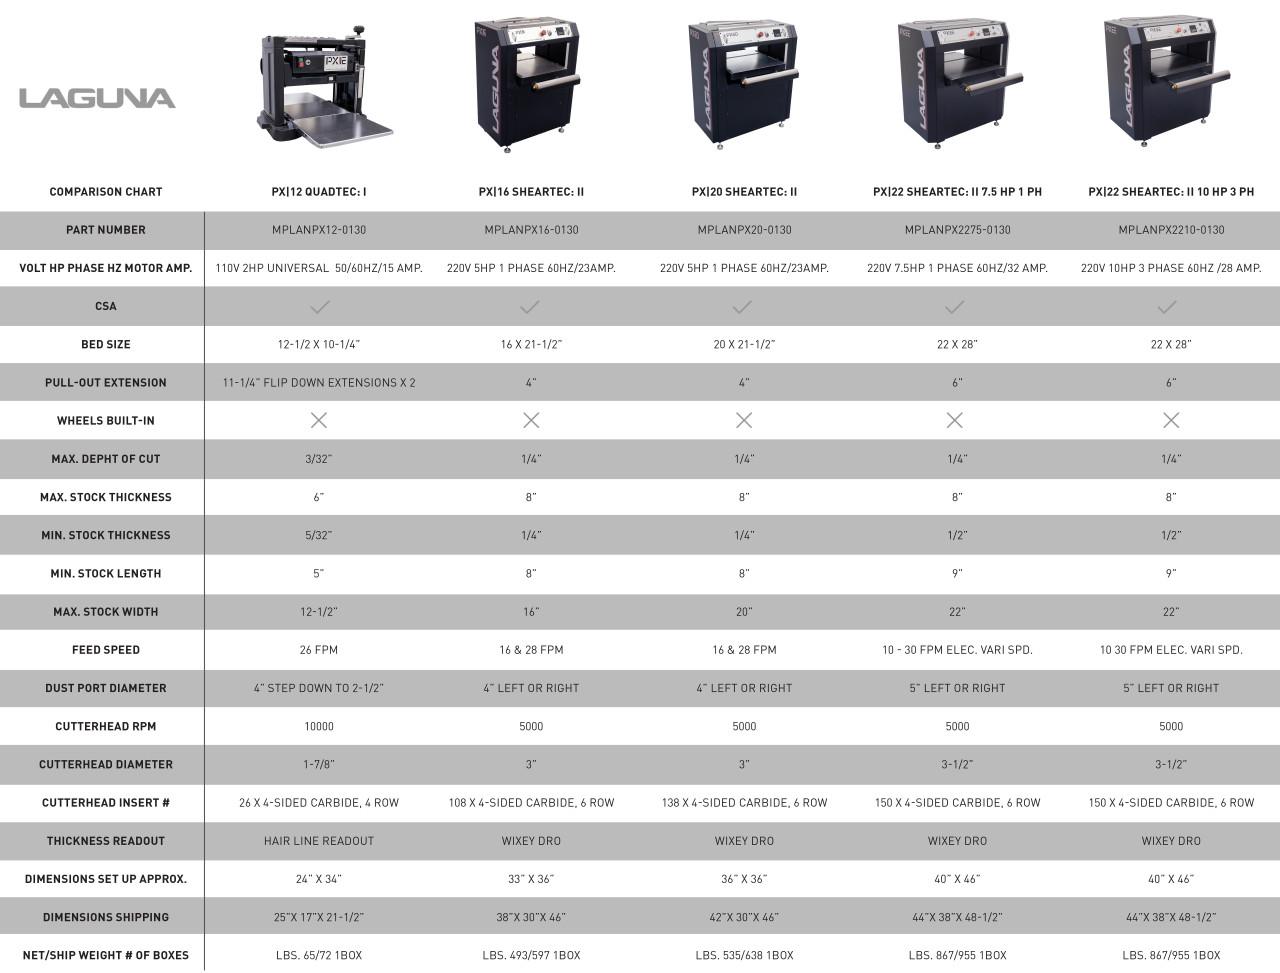 Laguna - PX 22 ShearTec: II Planer - 10hp; 220v, 28 Amps, 3 Phase (MPLANPX2210013)